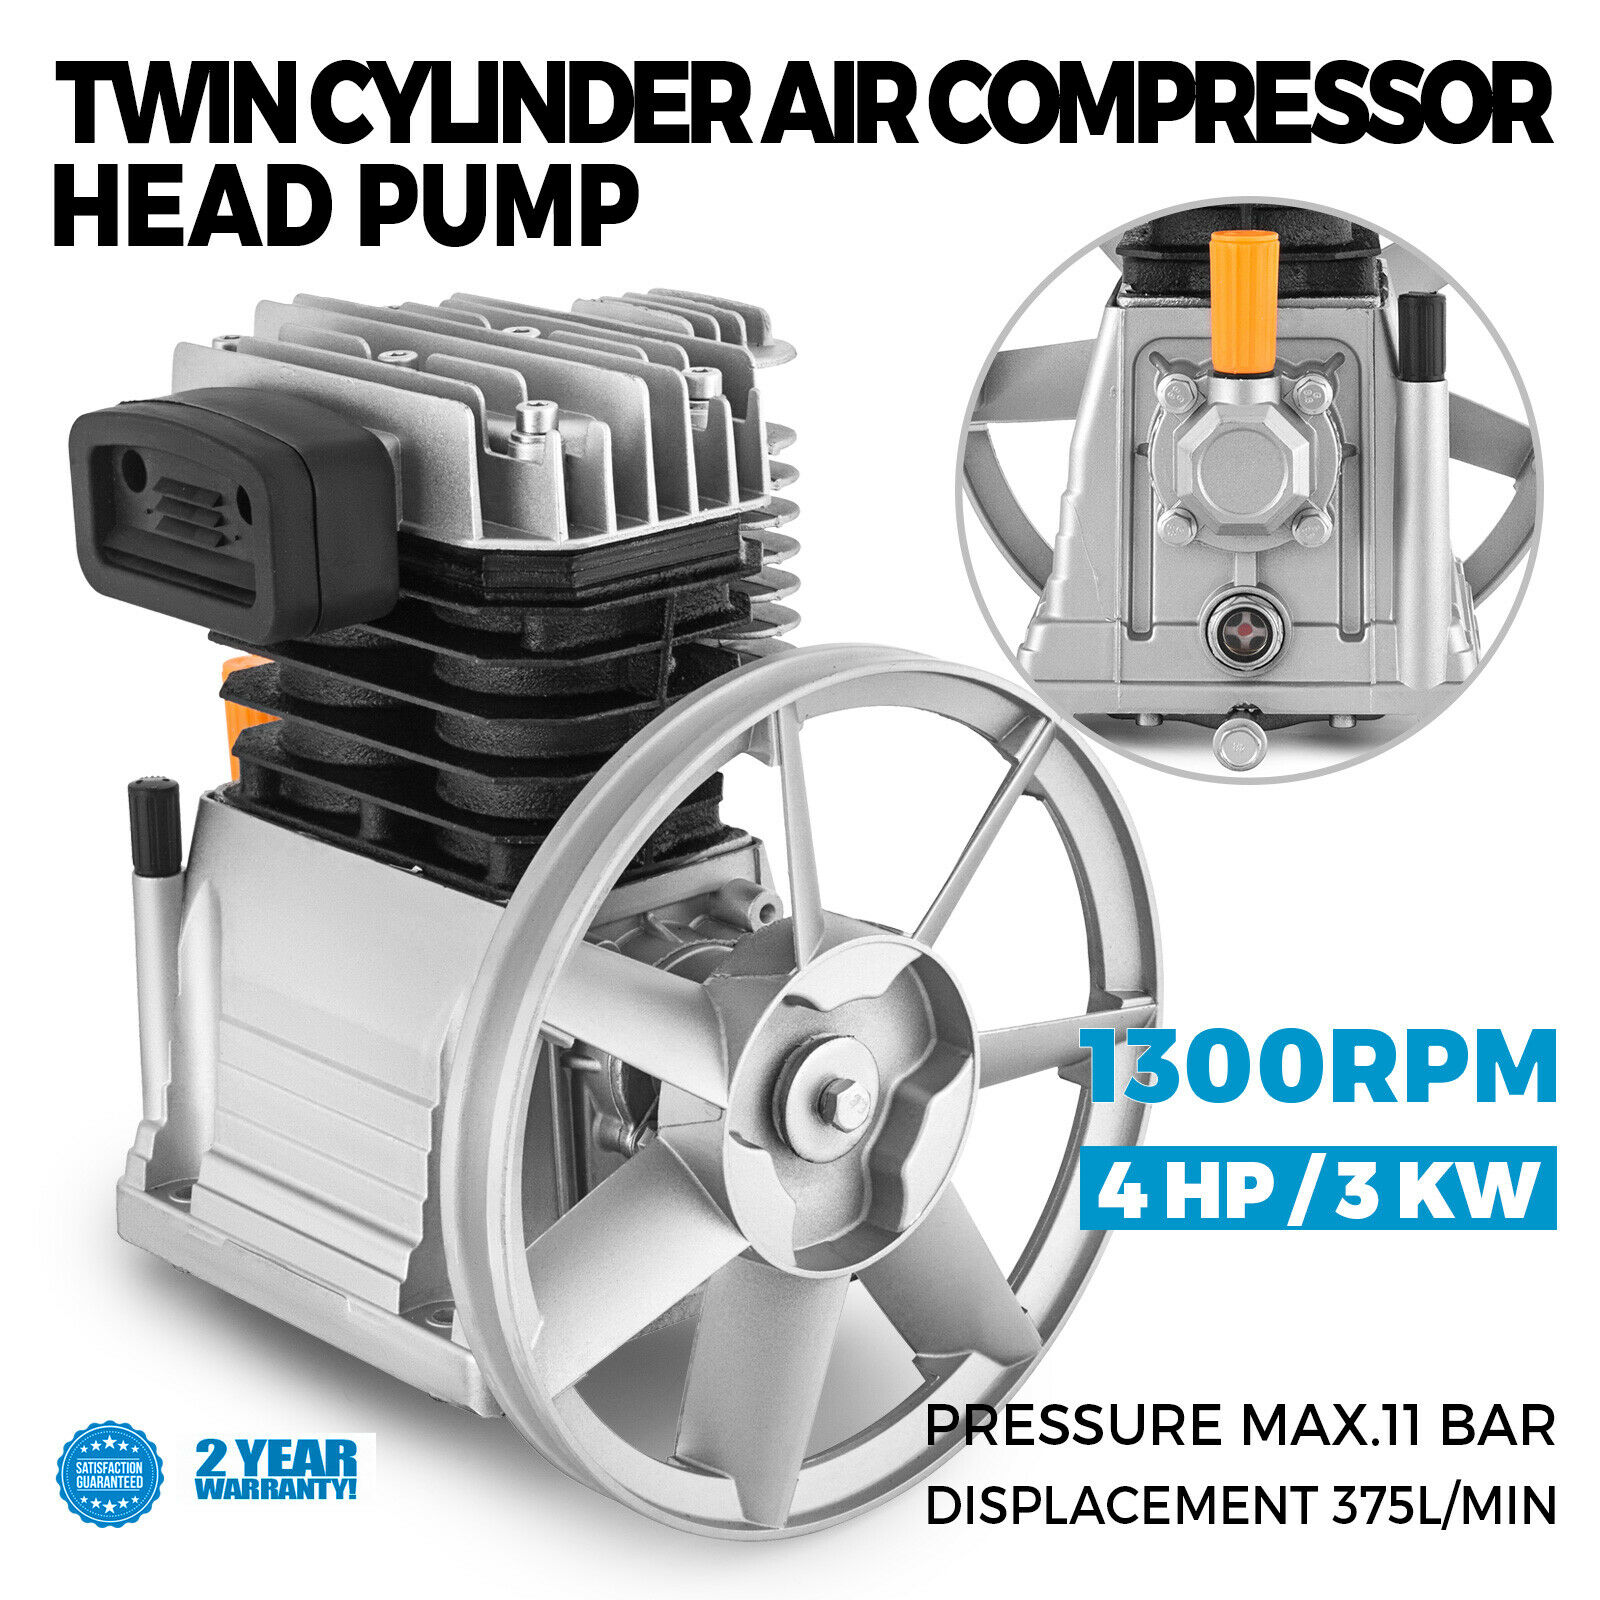 Air Compressor Head Pump 375L 3KW Piston Type Double Cylinder Pump Head 1300rpm 1 Stage 11 Bar Head Construction